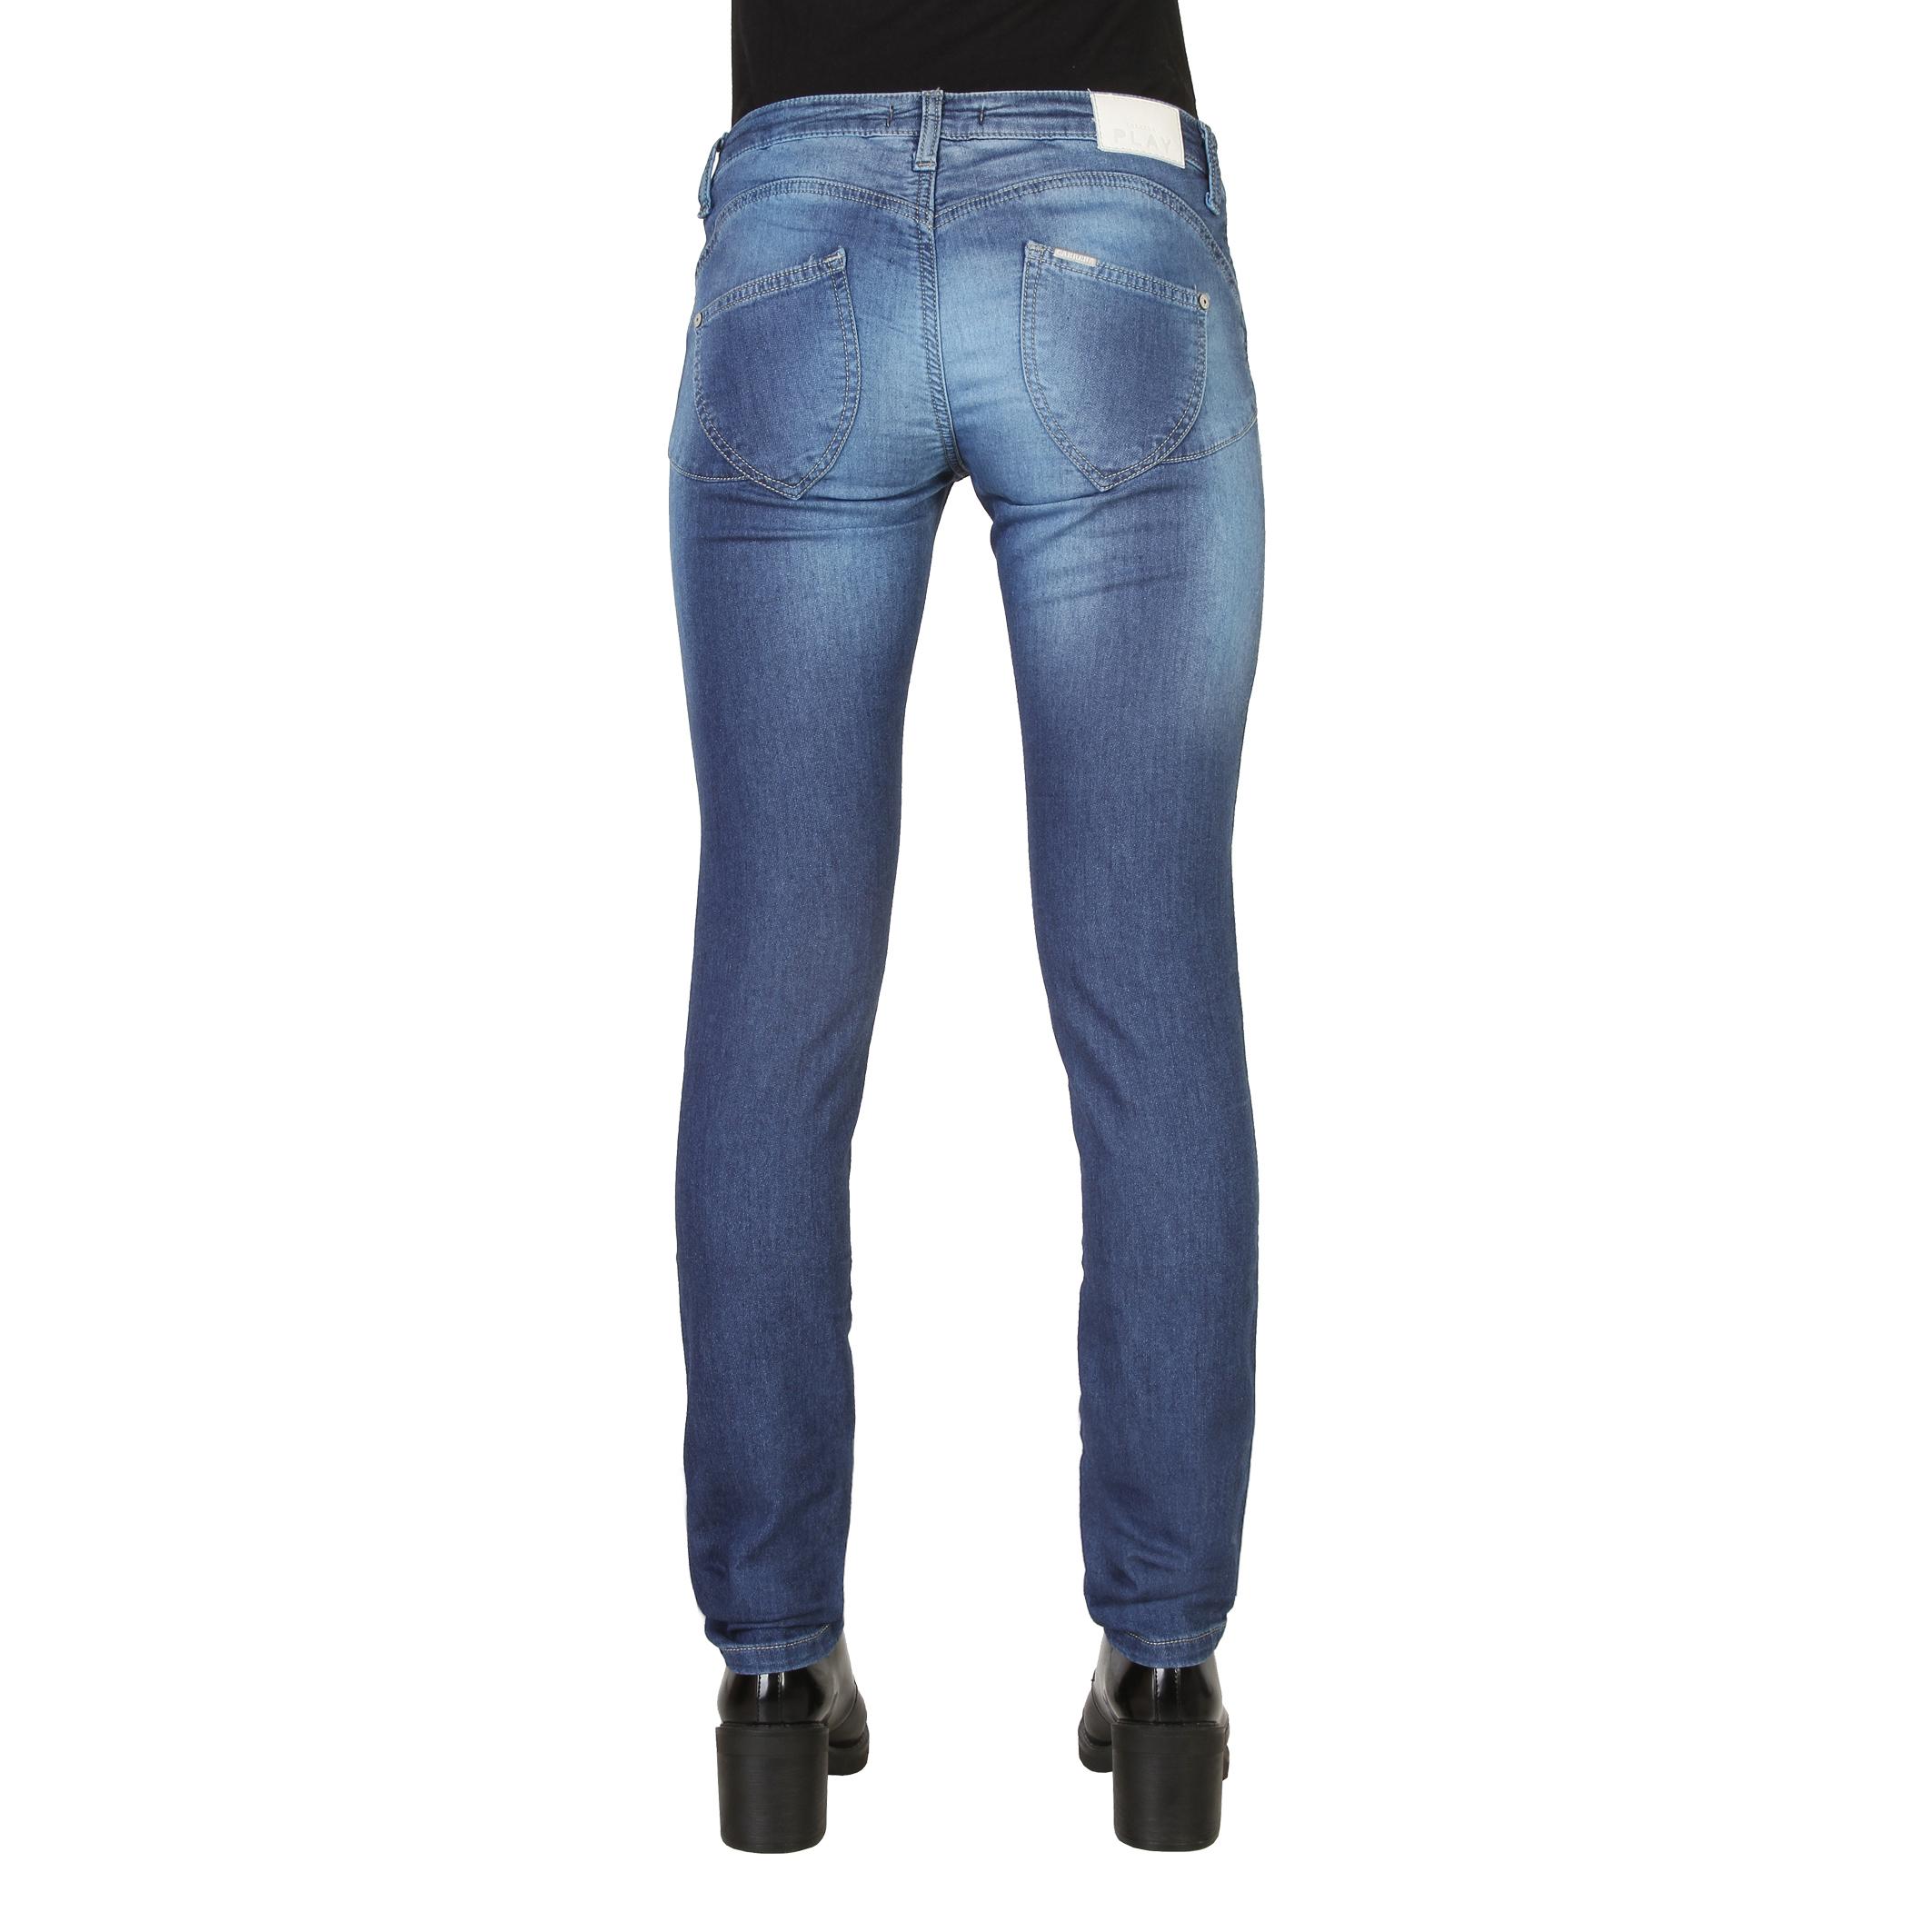 Jeans   Carrera Jeans 000788_0980A blue